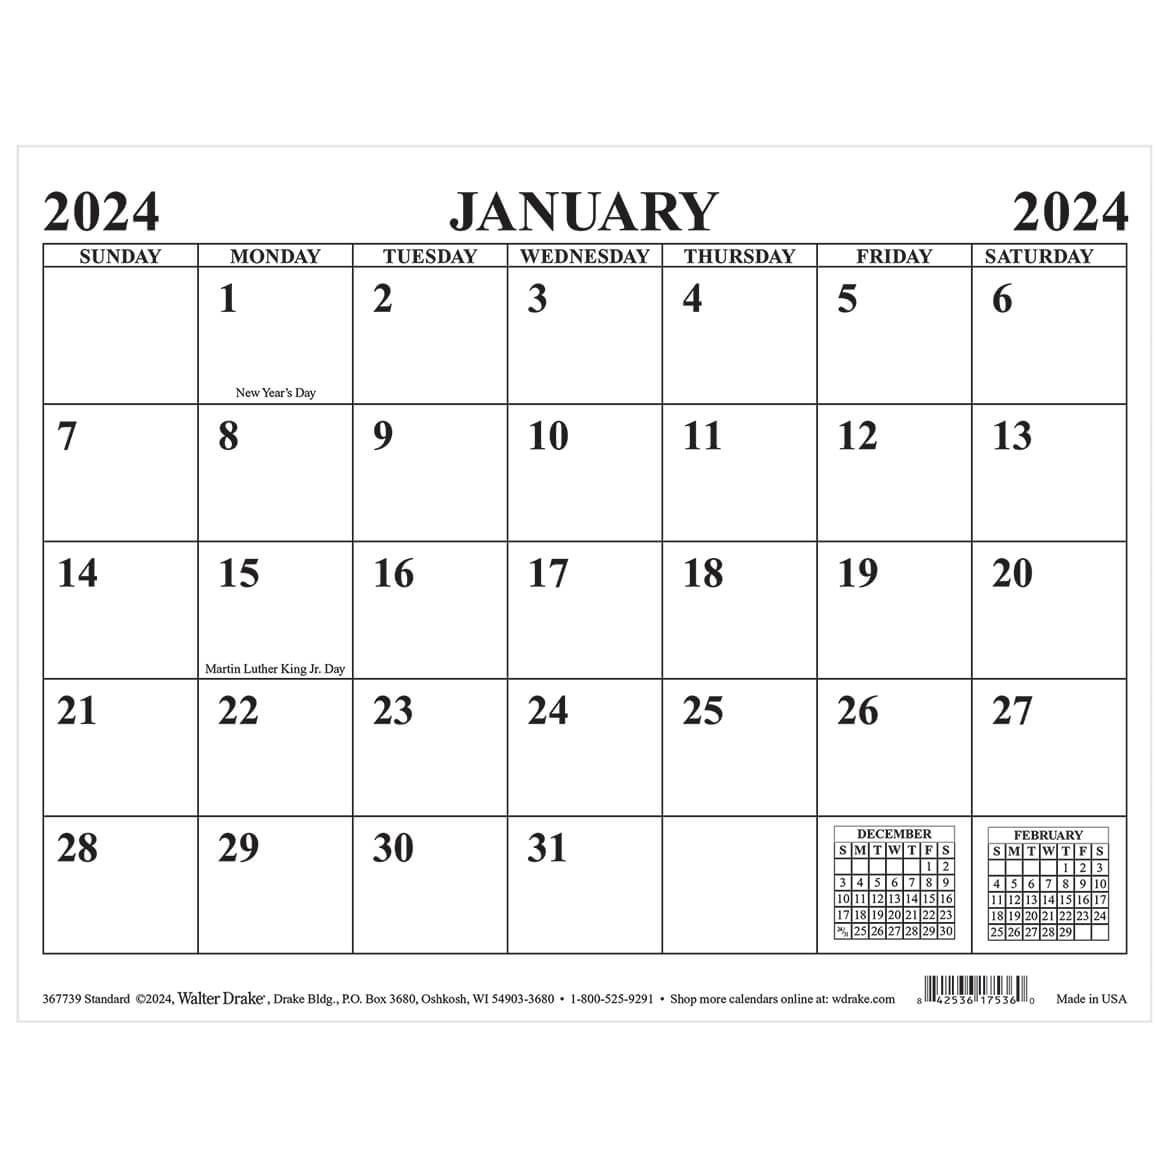 Standard Magnetic Calendar-367739